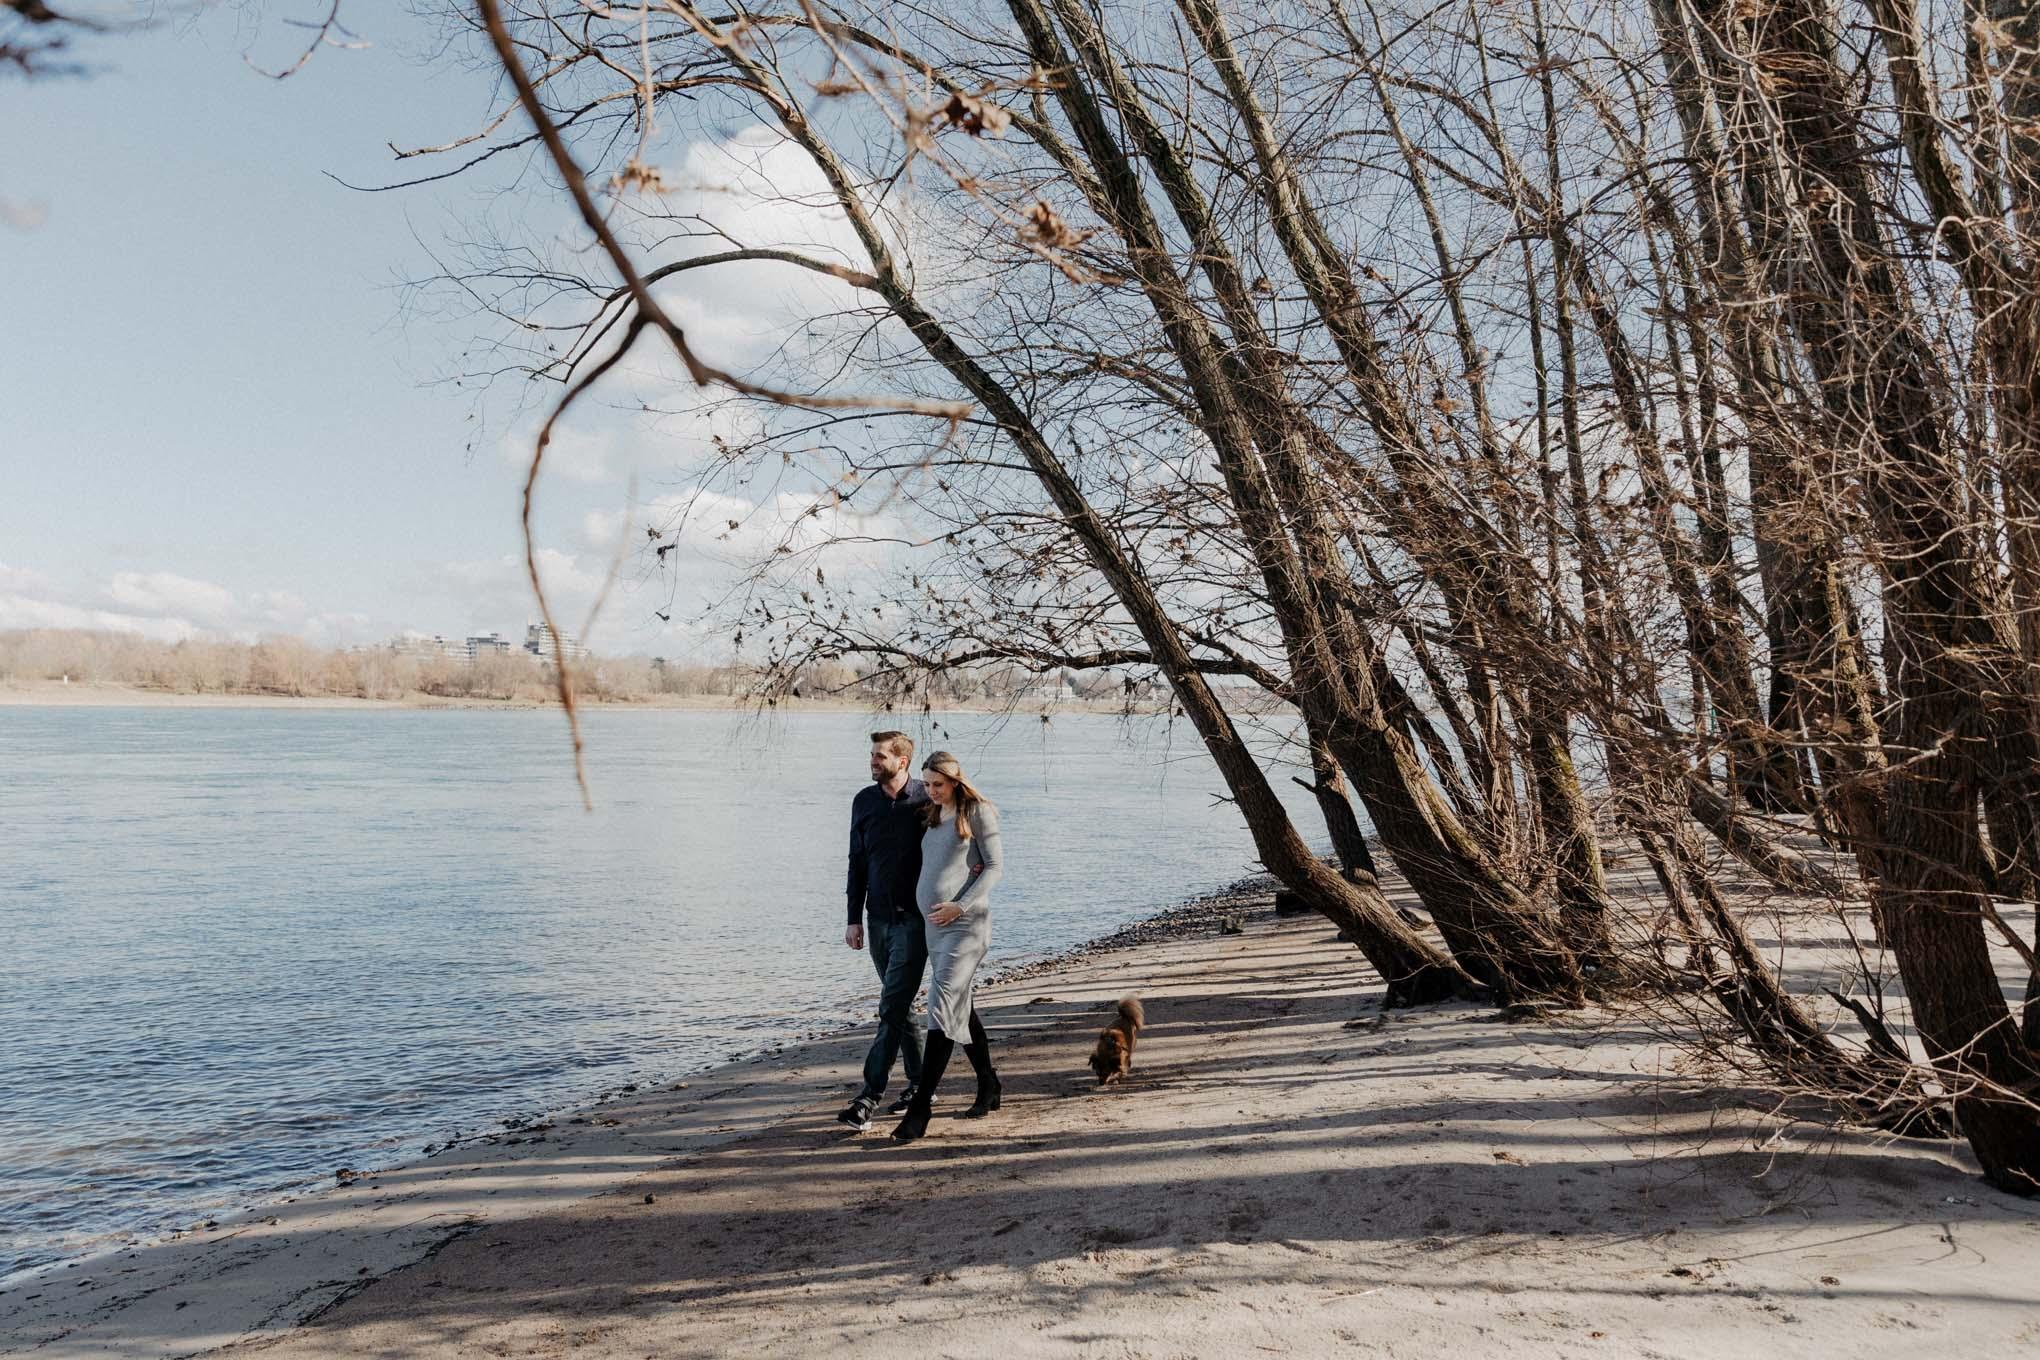 Paarfotos am Rheinufer in Koeln Suerth